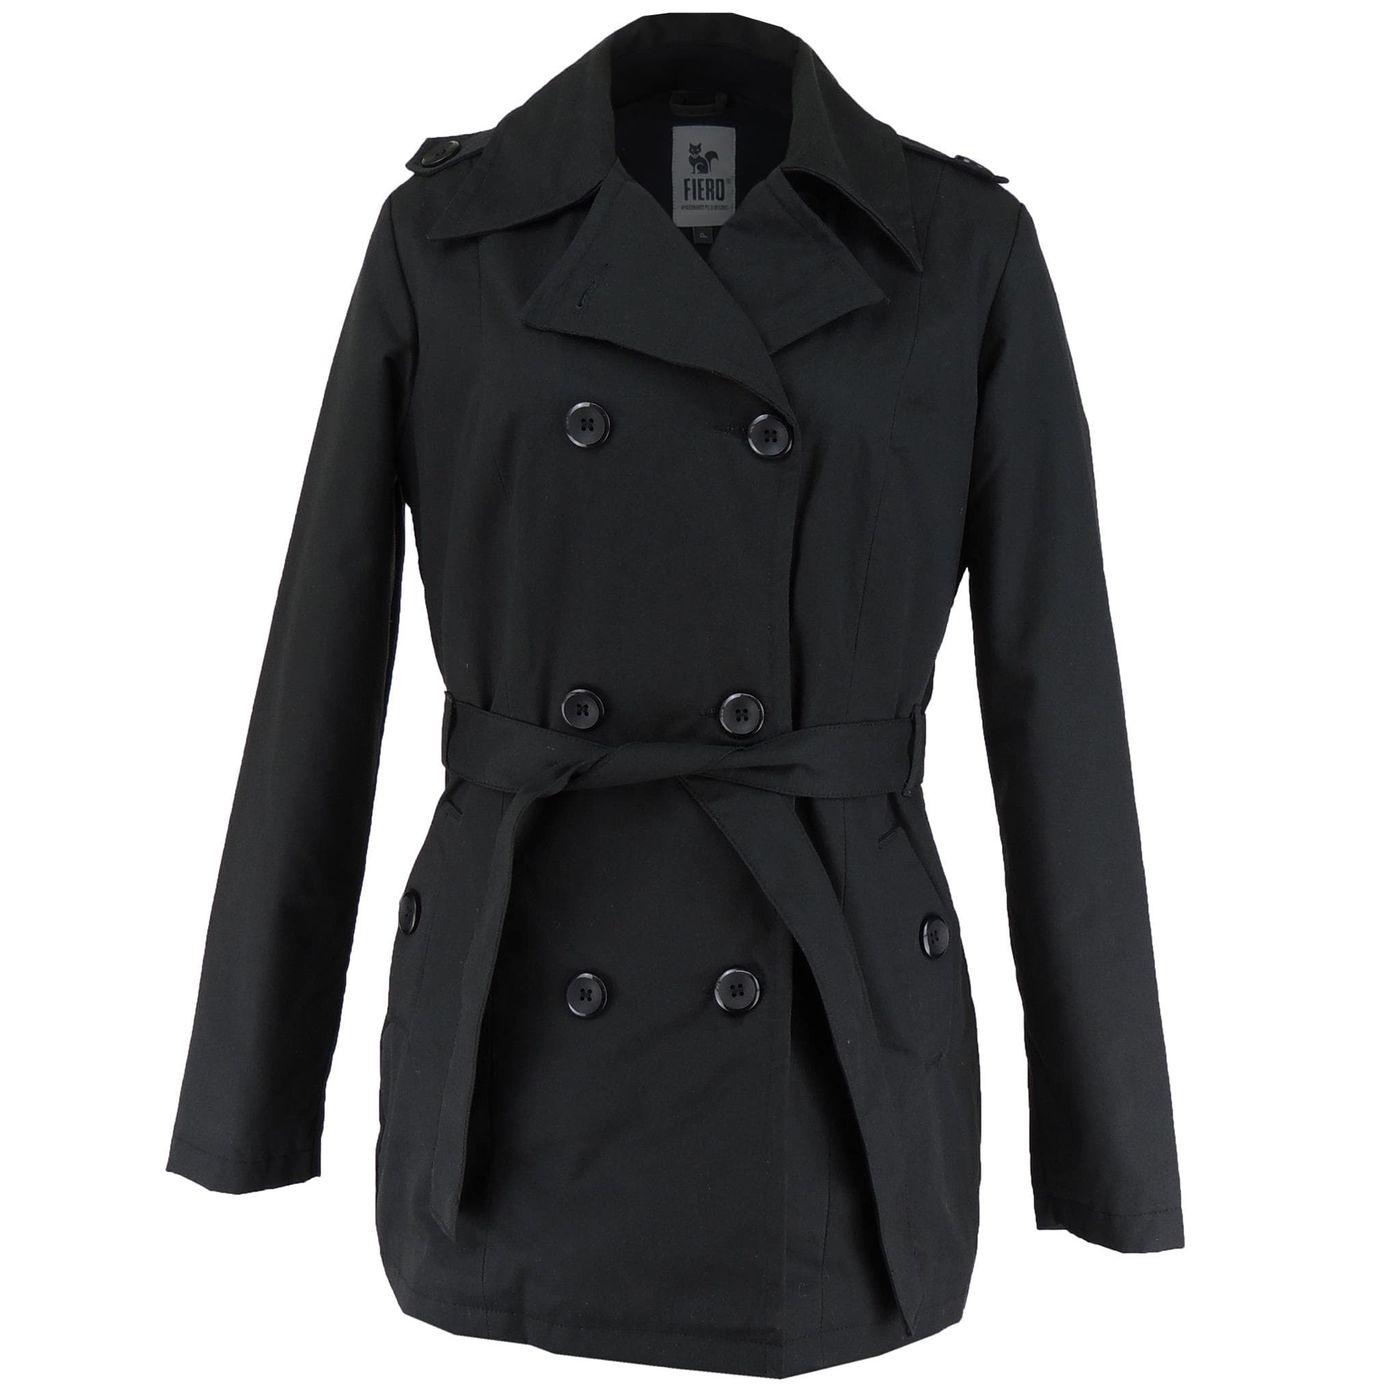 Casaco Feminino Trech Coat Térmico para o frio - fieroshop 47a842978dc